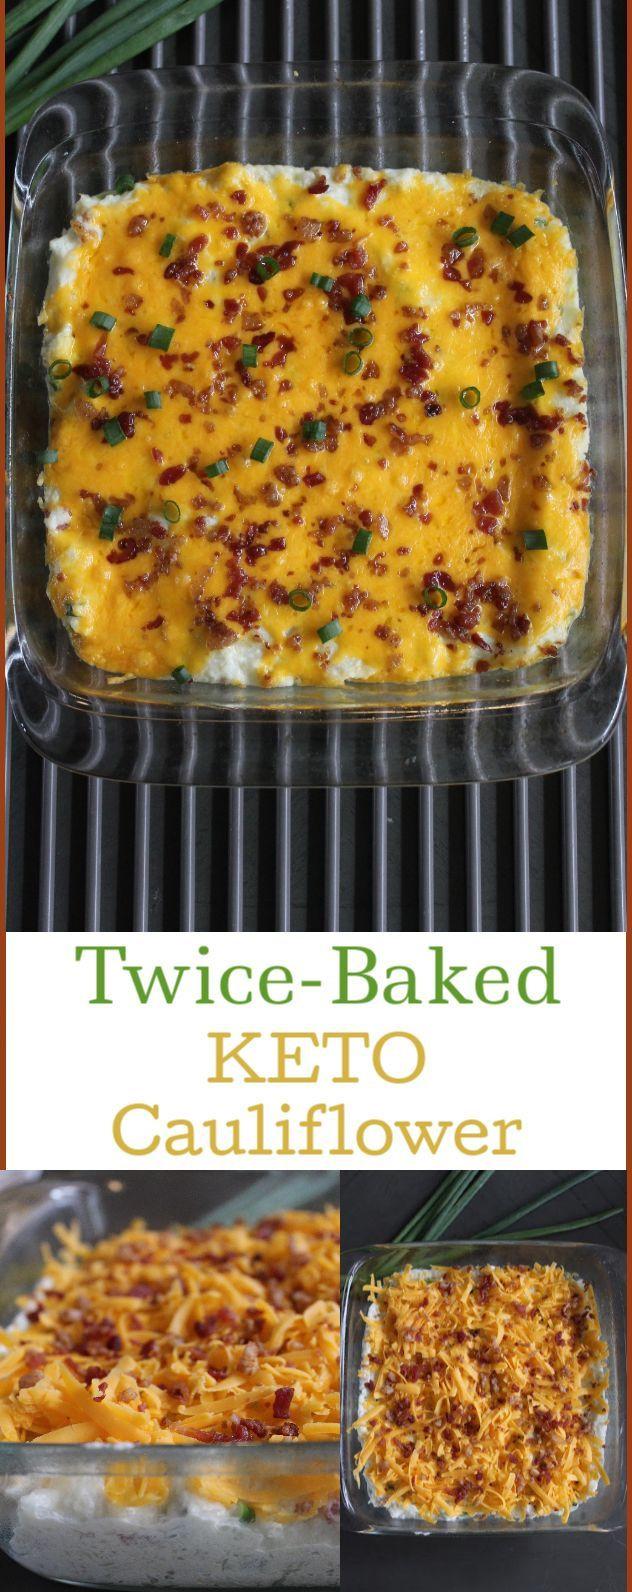 Twice Baked Cauliflower Keto  Keto Twice Baked Cauliflower Recipe in 2020